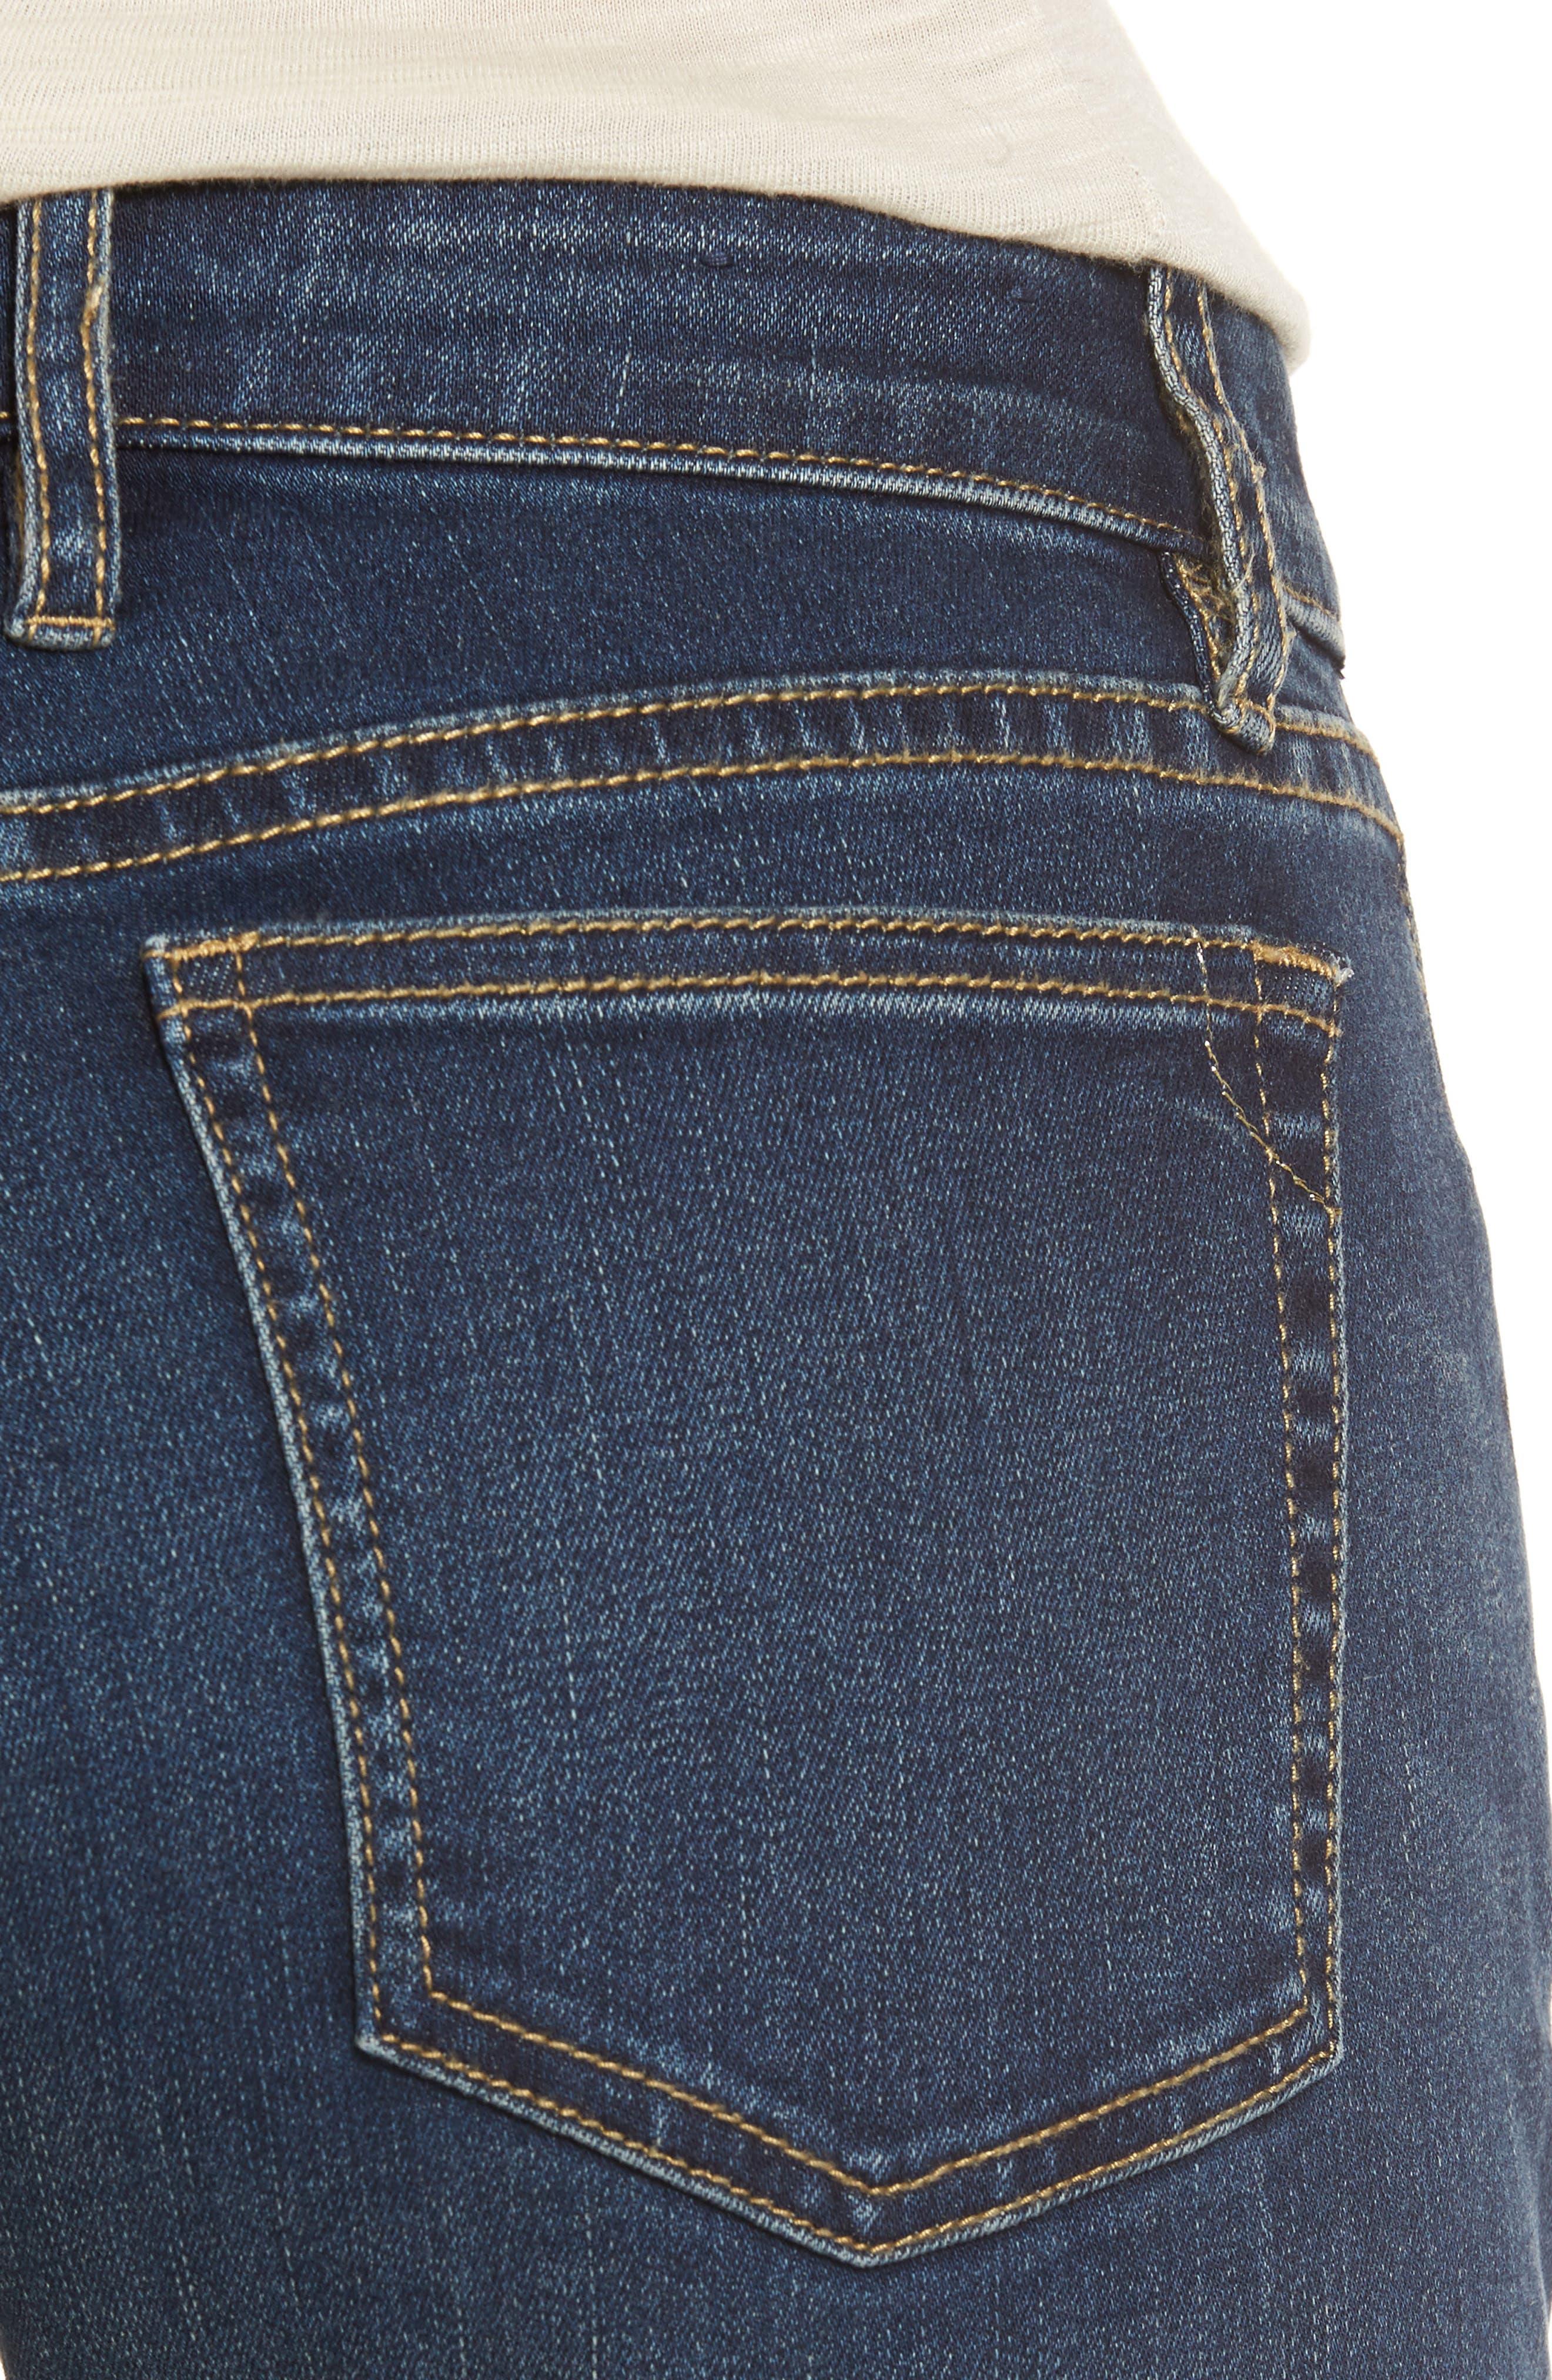 Tema Slim Boyfriend Jeans,                             Alternate thumbnail 12, color,